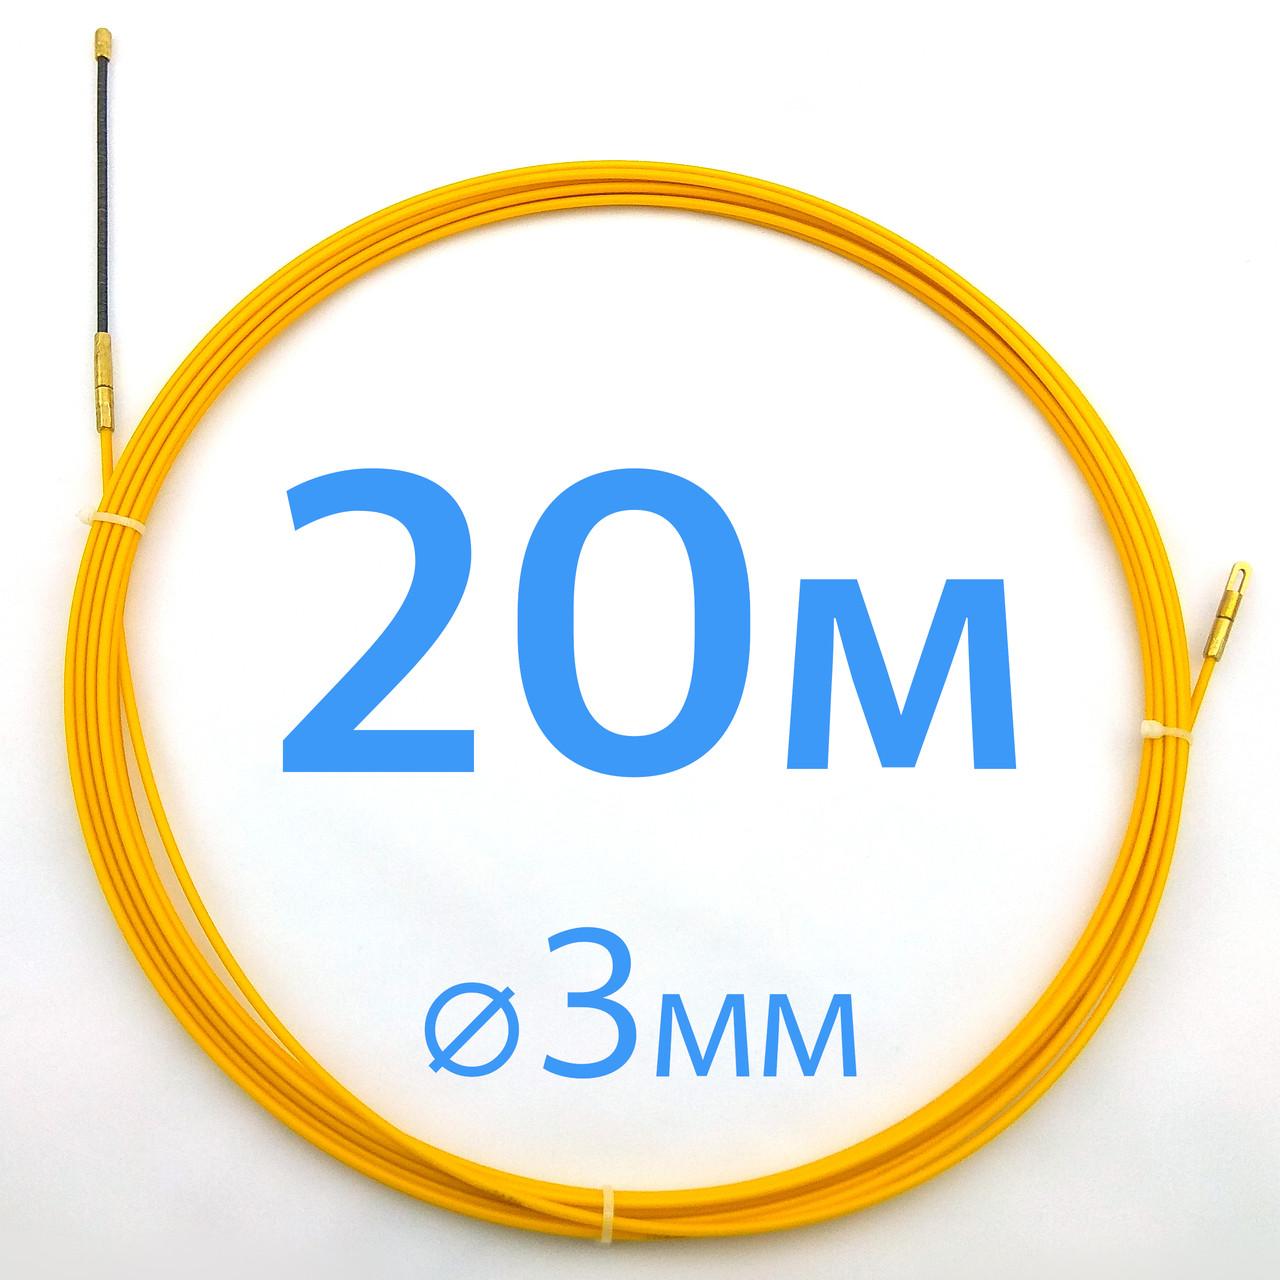 Кабельная протяжка, стеклопруток 3мм х 20м + 2 наконечника